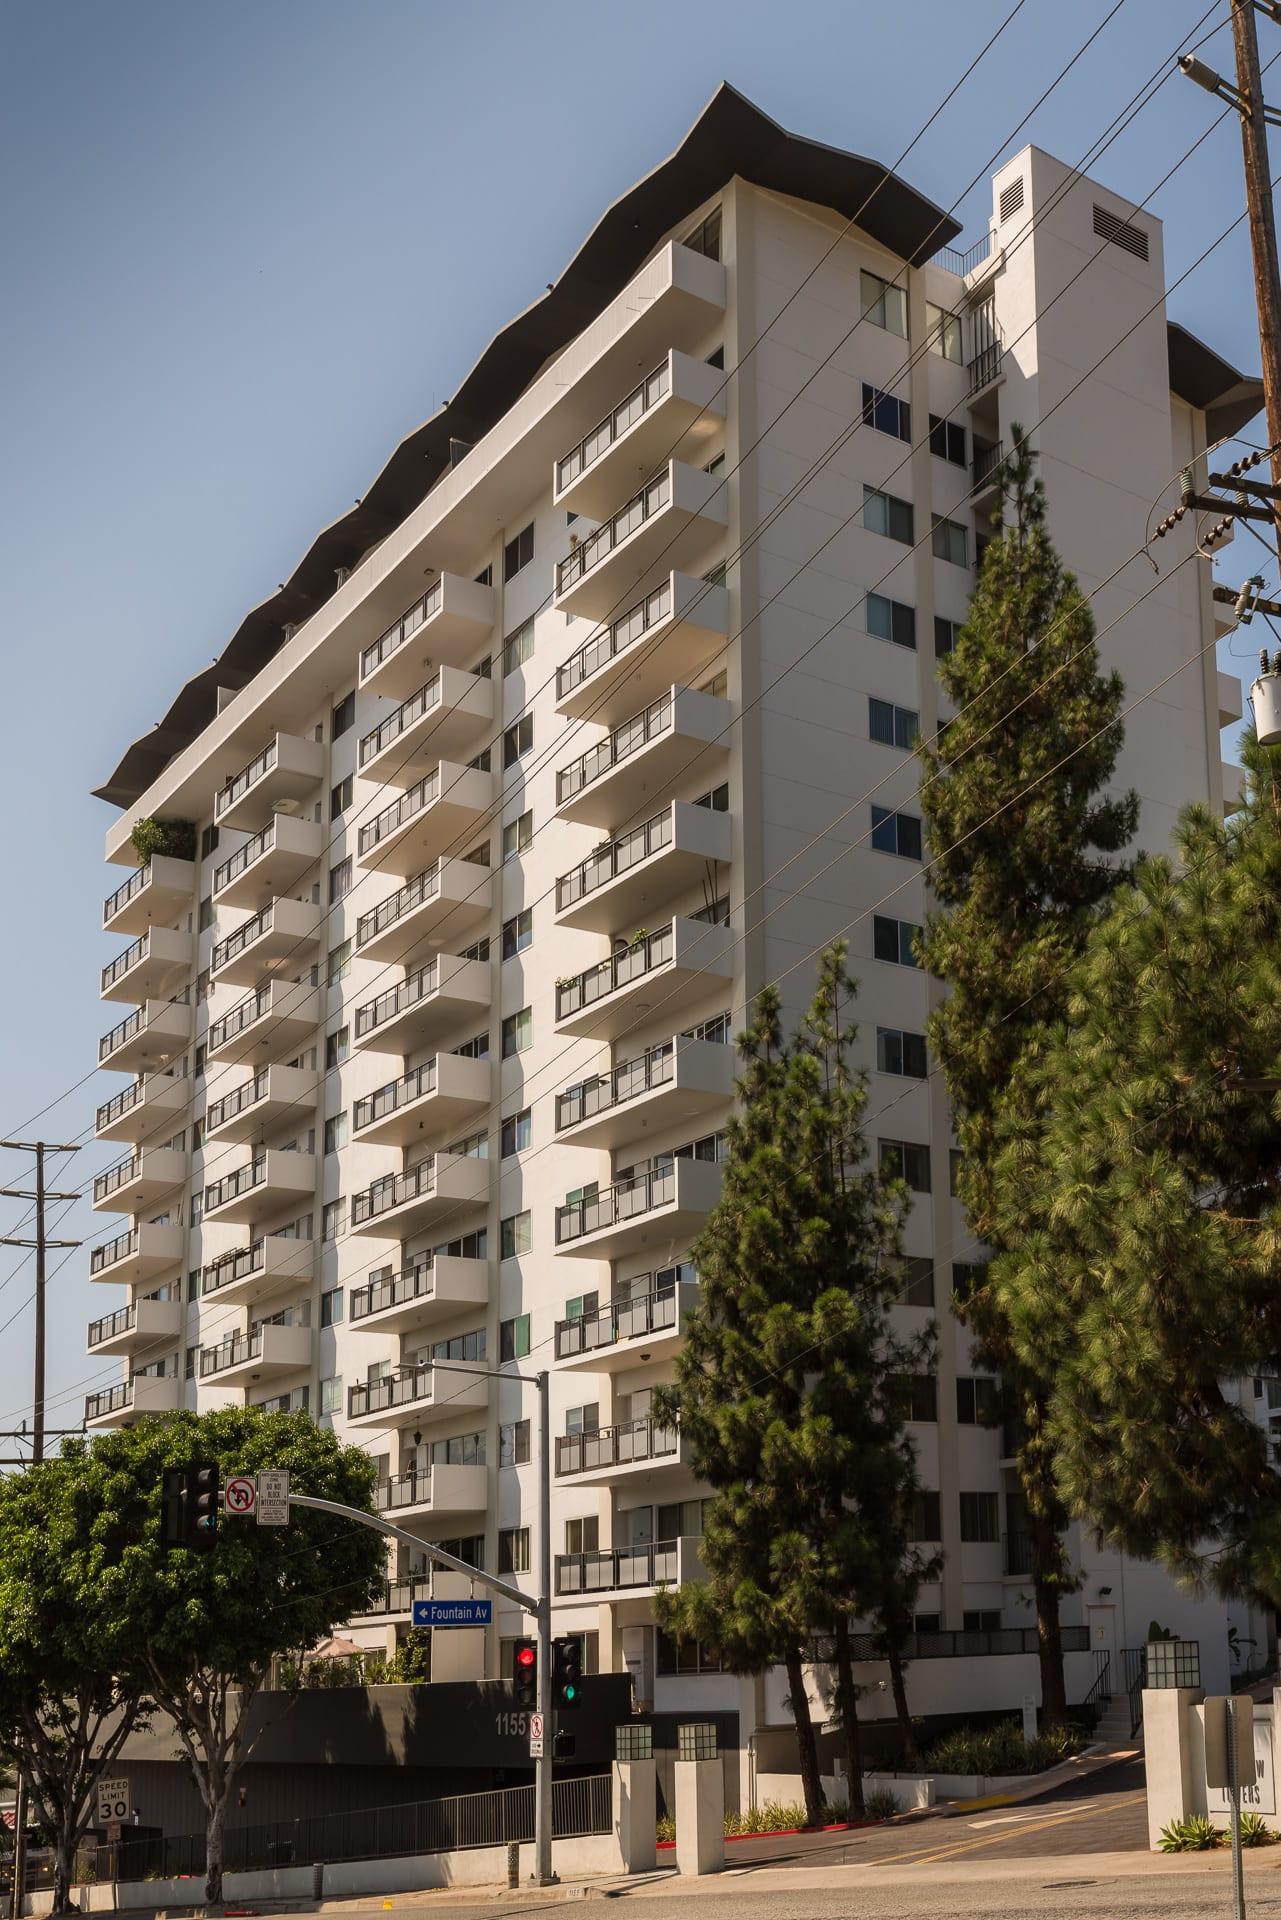 1155 North La Cienega Boulevard, Unit 610 photo